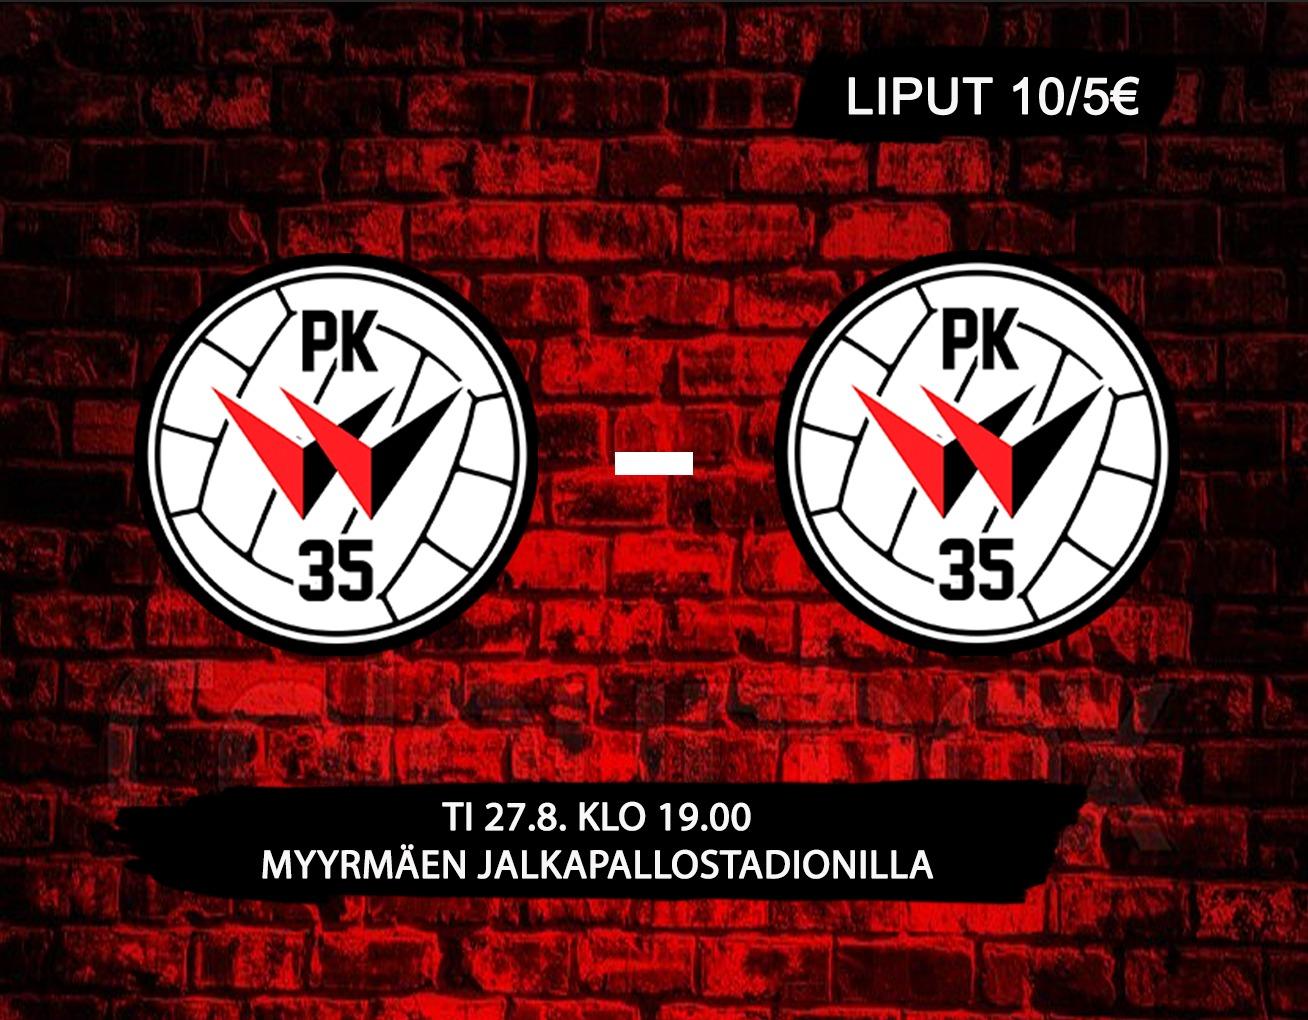 PK 35 Vantaa – PK 35, Instagram